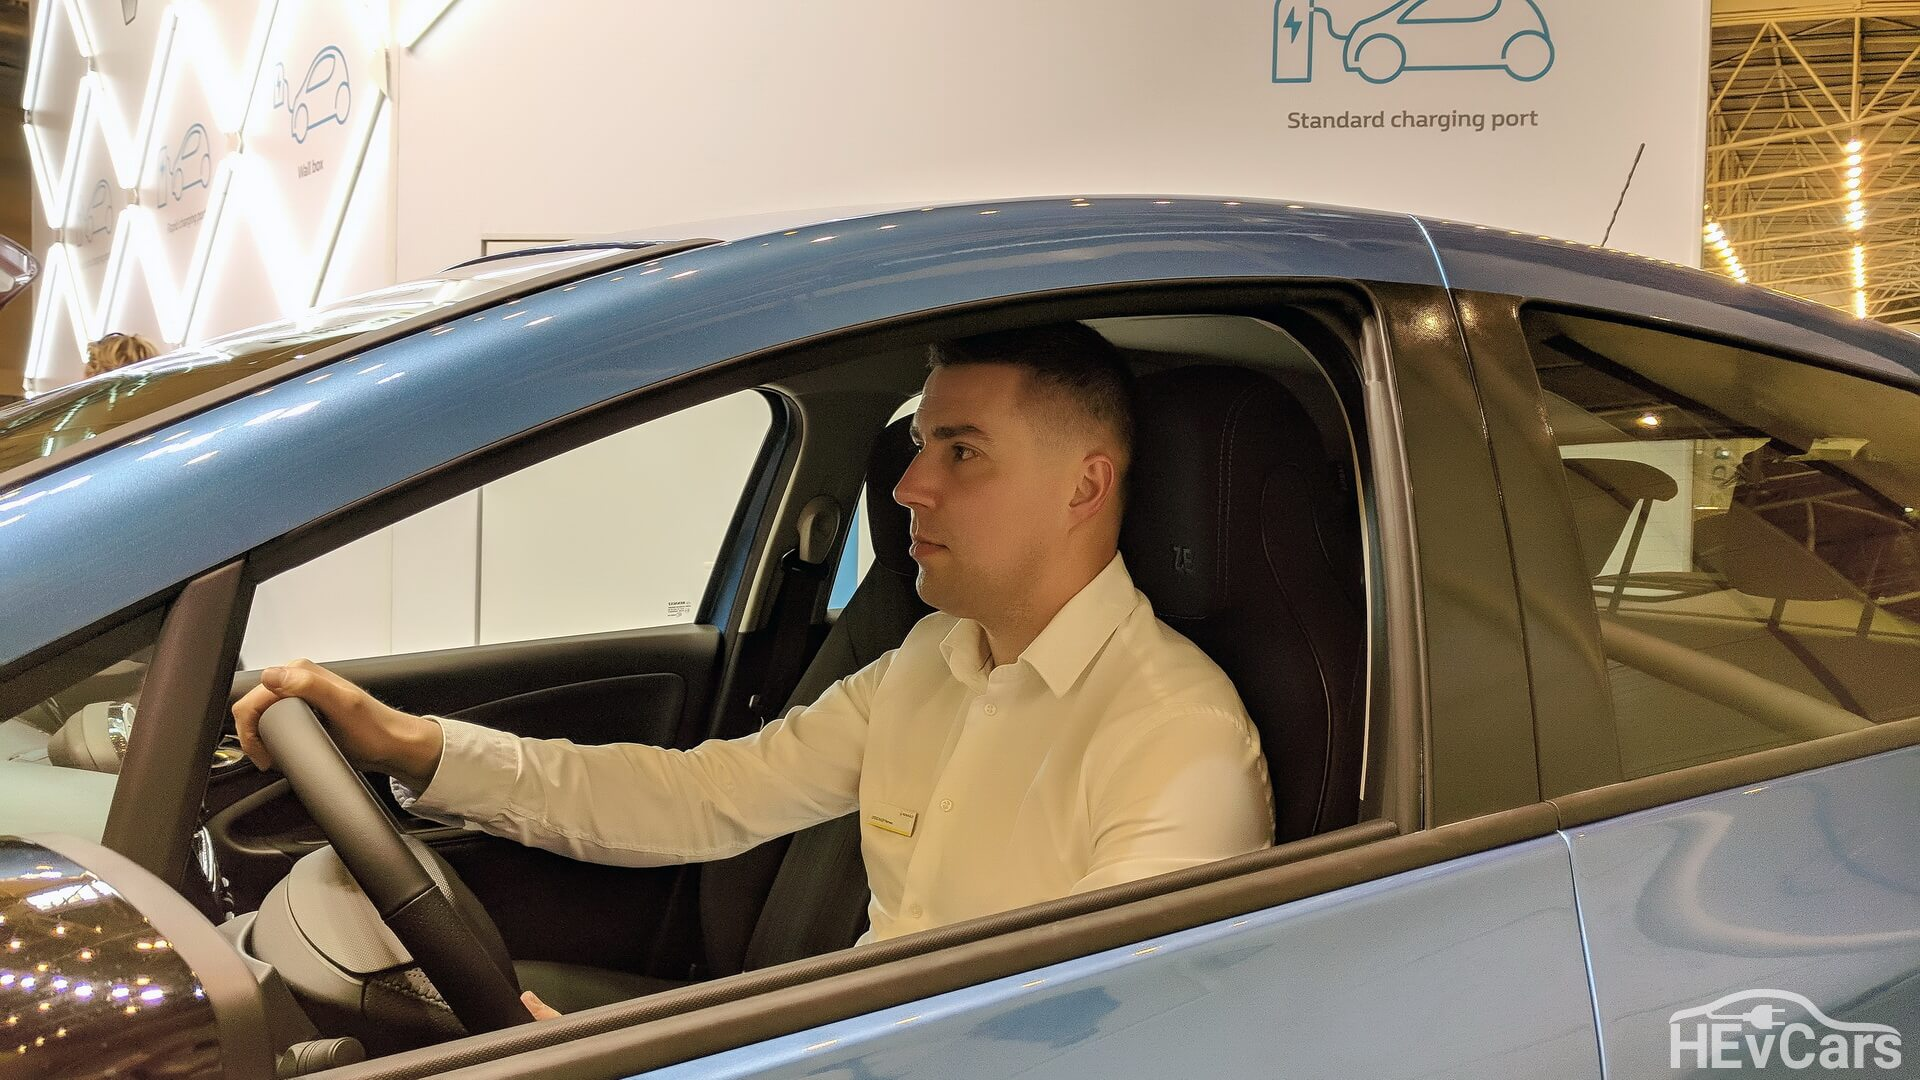 Александр Мытник, менеджер по продуктам «Renault Украина» в электромобиле Renault ZOE